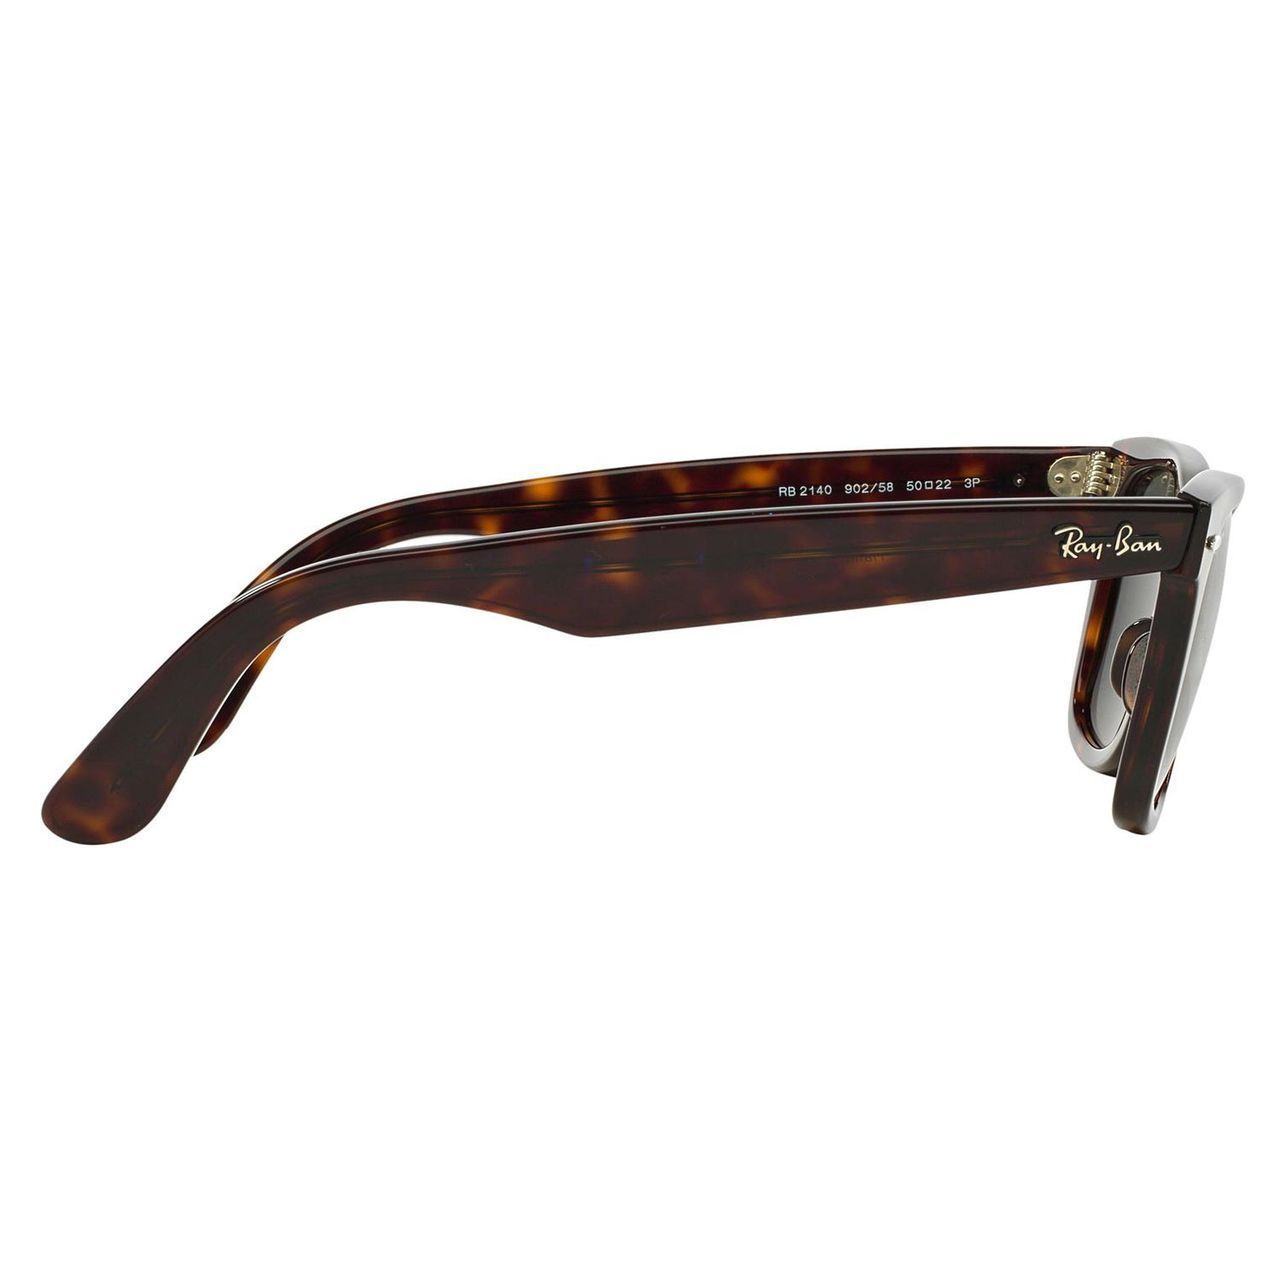 1e1b36a90c7 Shop Ray Ban Unisex RB 2140 Original Wayfarer 902 58 Havana Plastic  Polarized 50mm Sunglasses - Free Shipping Today - Overstock - 9990464